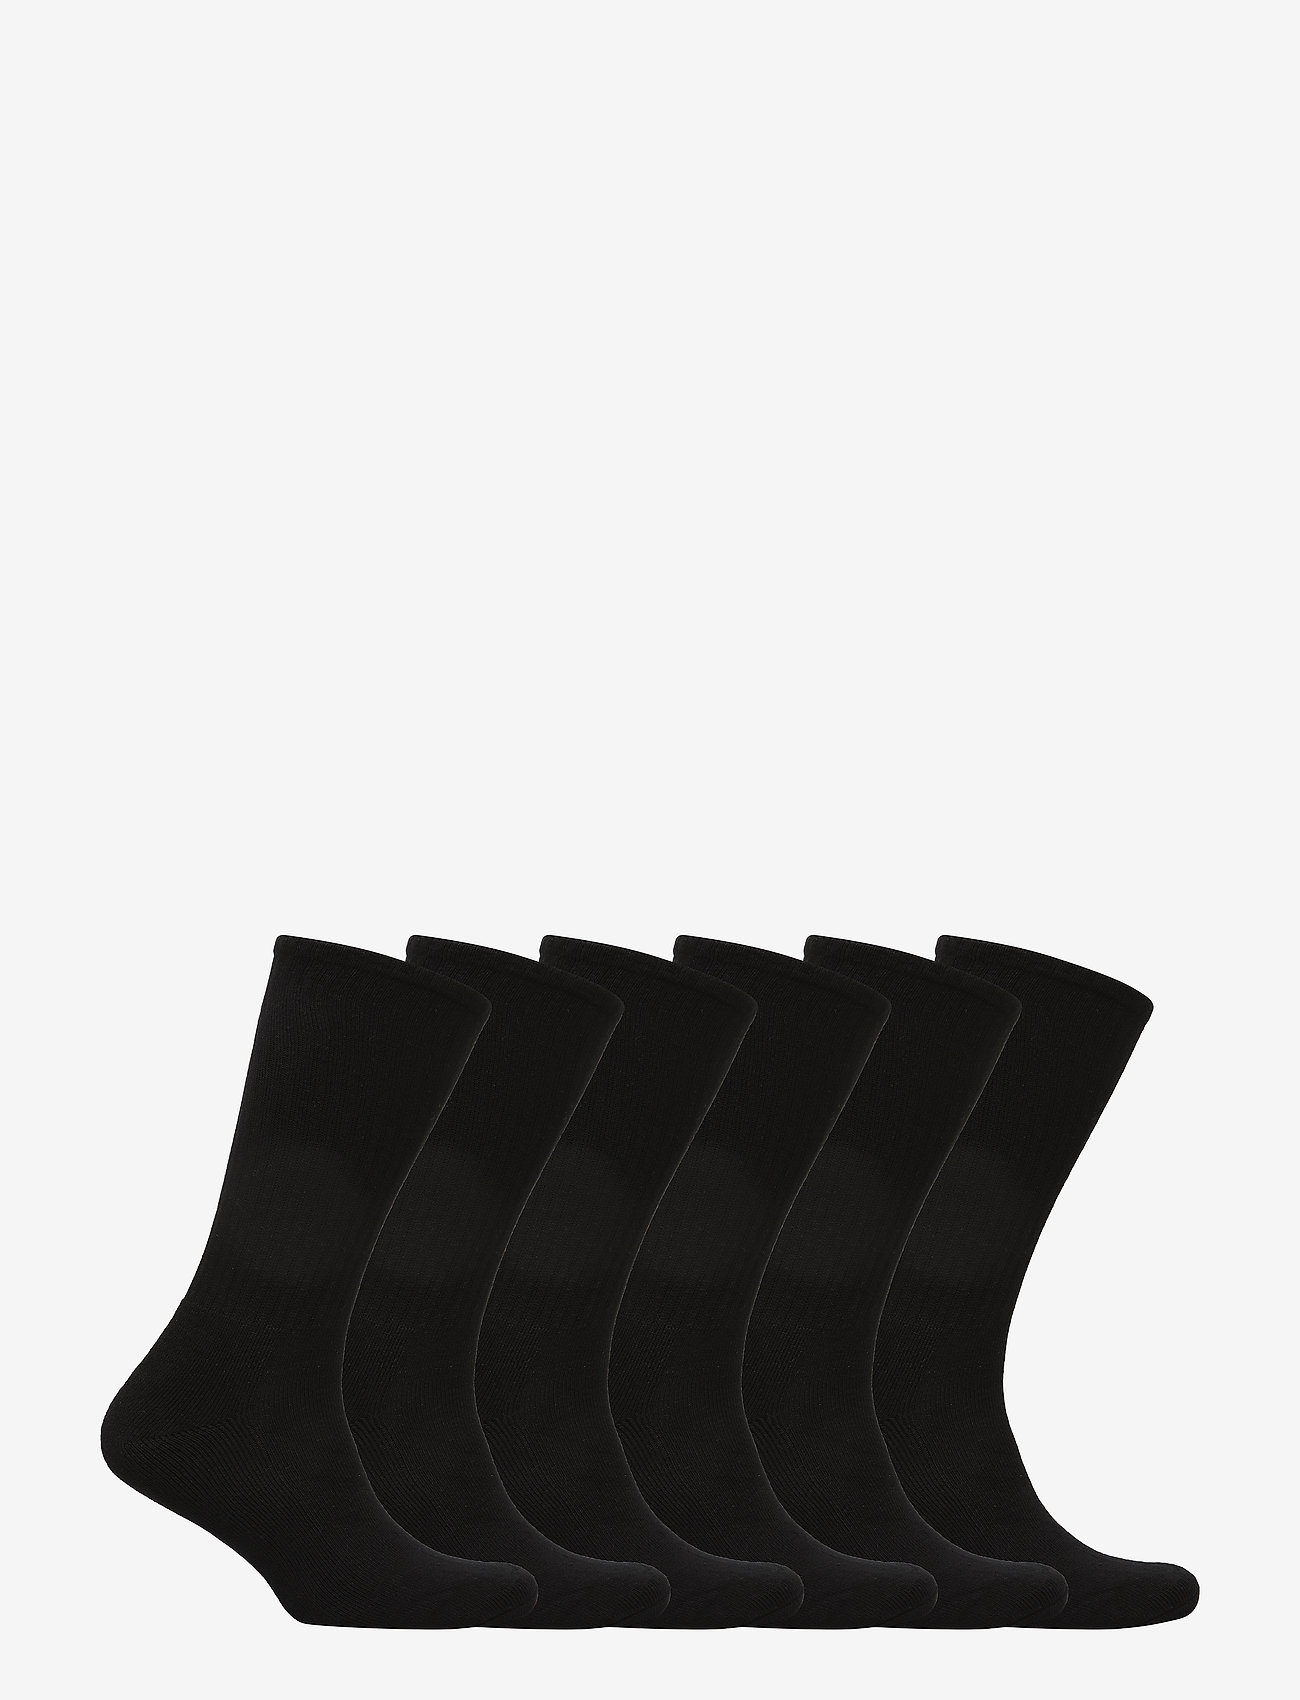 Polo Ralph Lauren Underwear - Cotton-Blend Crew Sock 6-Pack - regular socks - black - 1